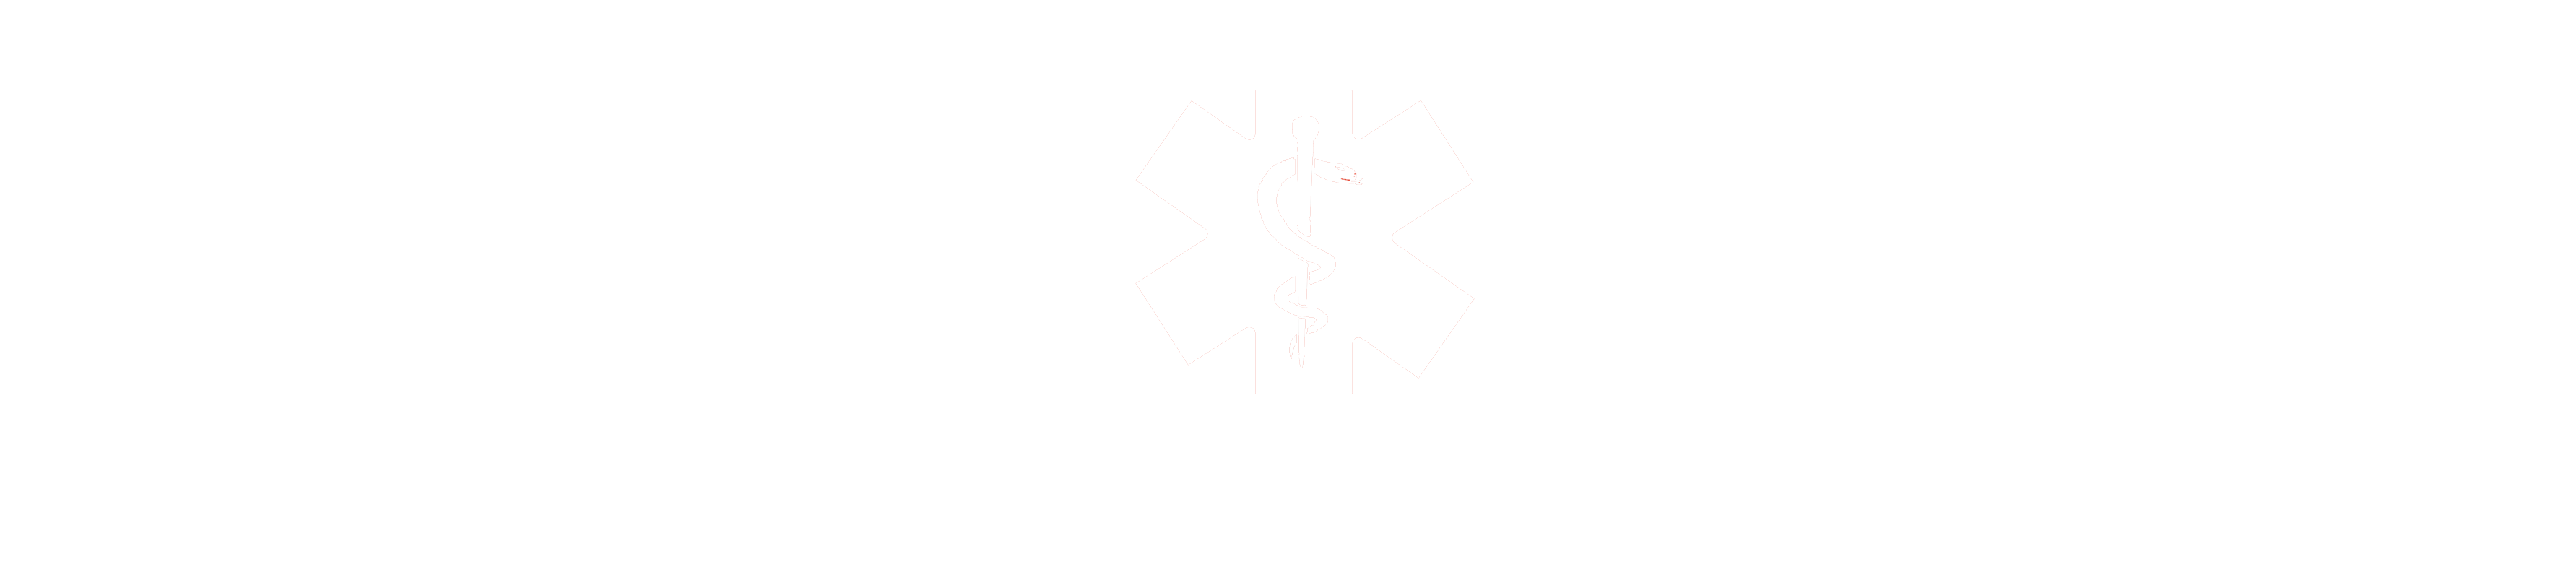 Sanitätshaus & Rehatechnik Hamburg SRH-GmbH